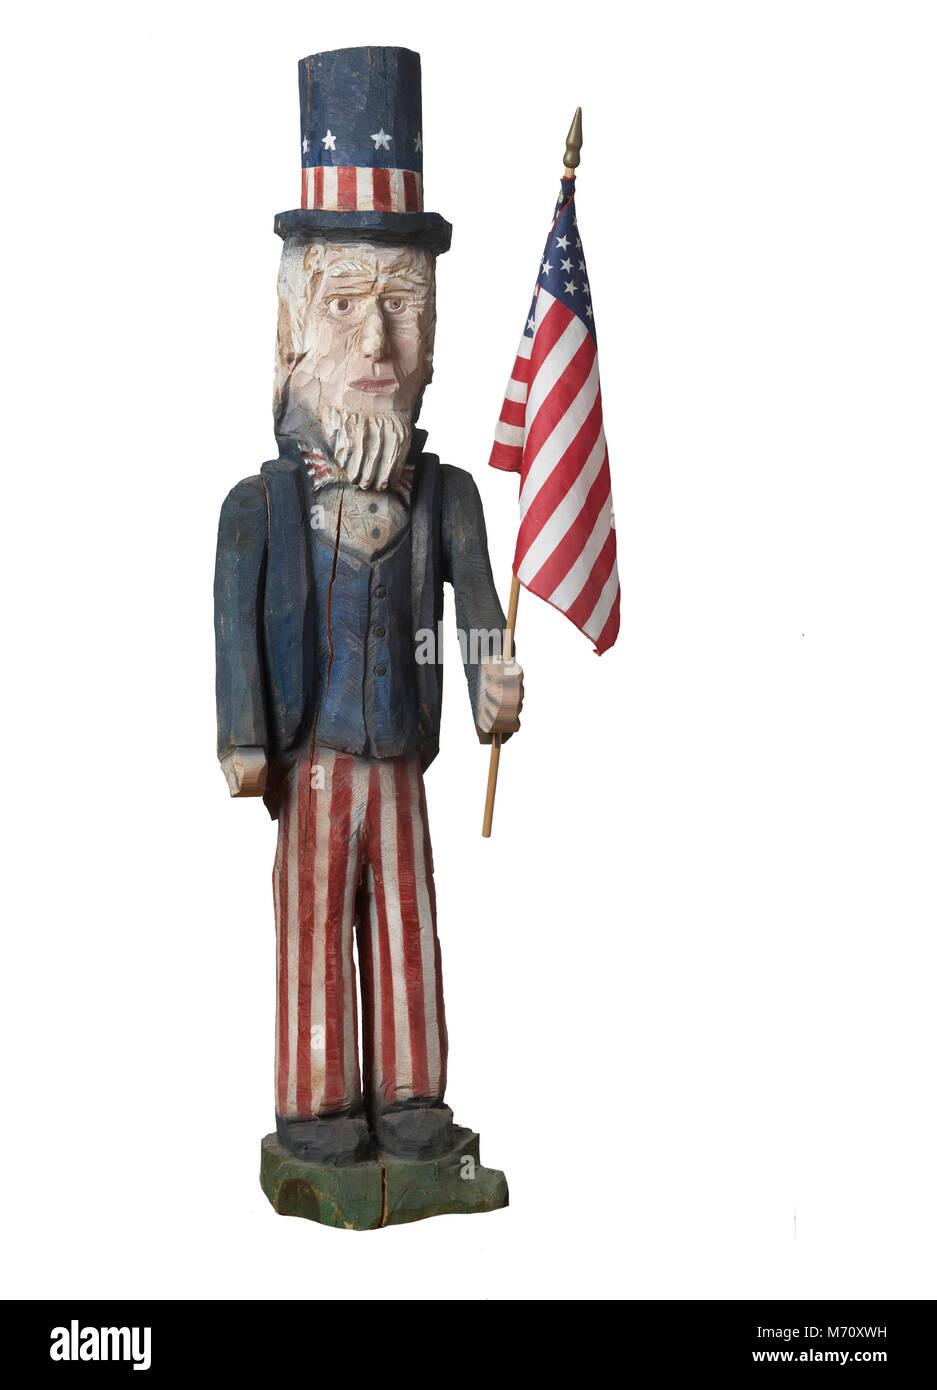 Uncle Sam chainsaw folk art sculpture - Stock Image